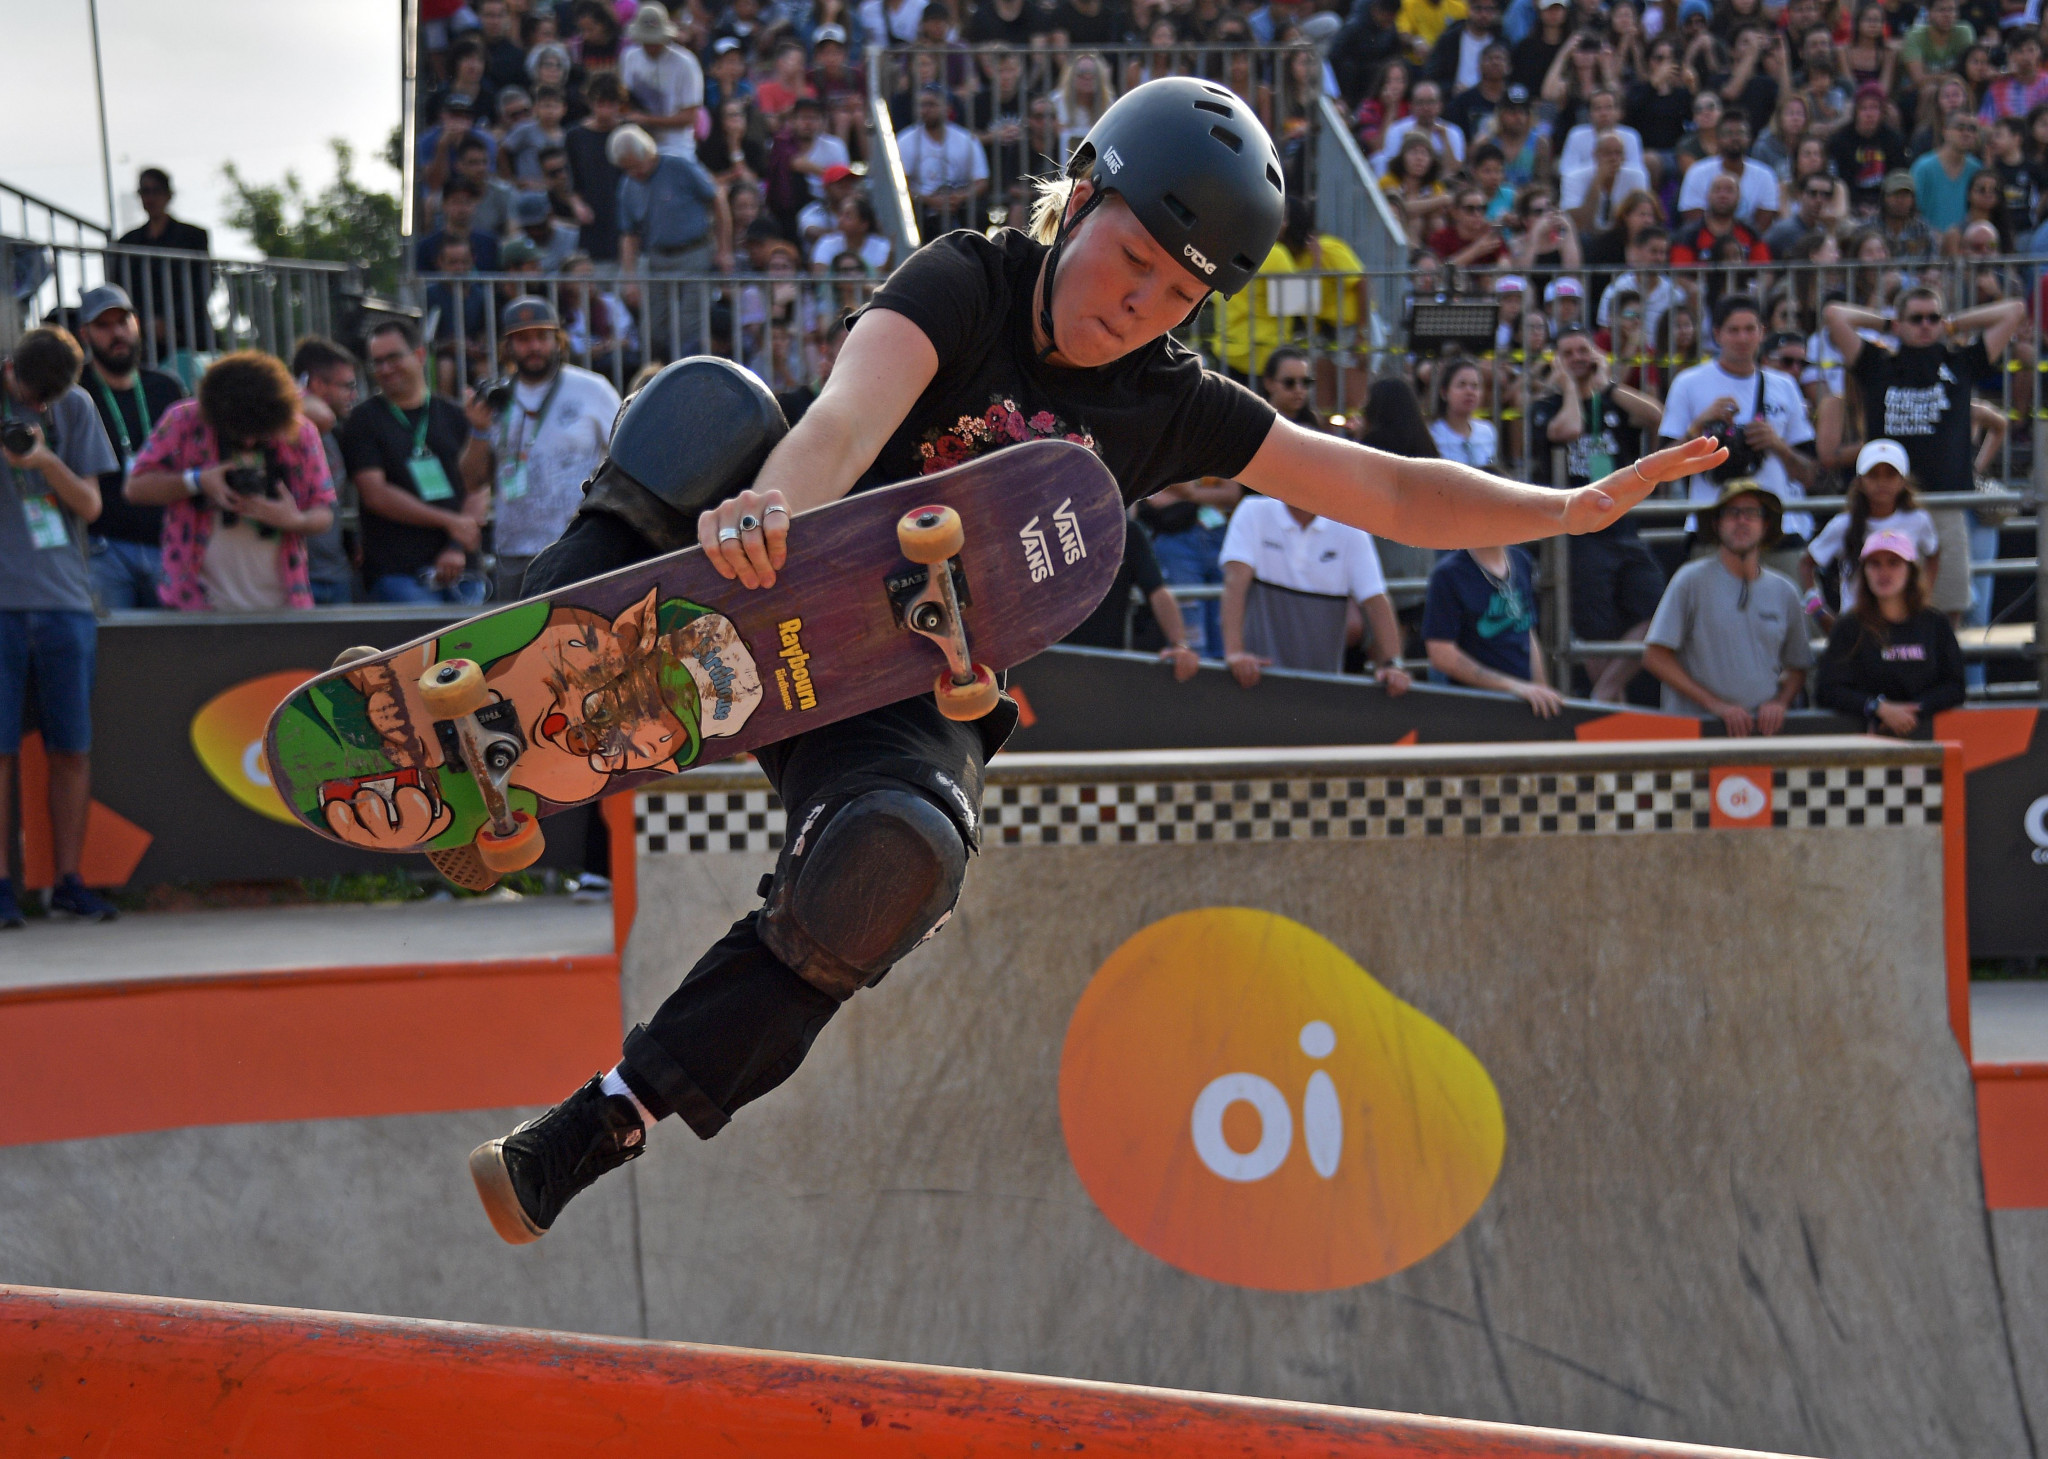 Australian team miss vital skateboarding event after COVID-19 outbreak